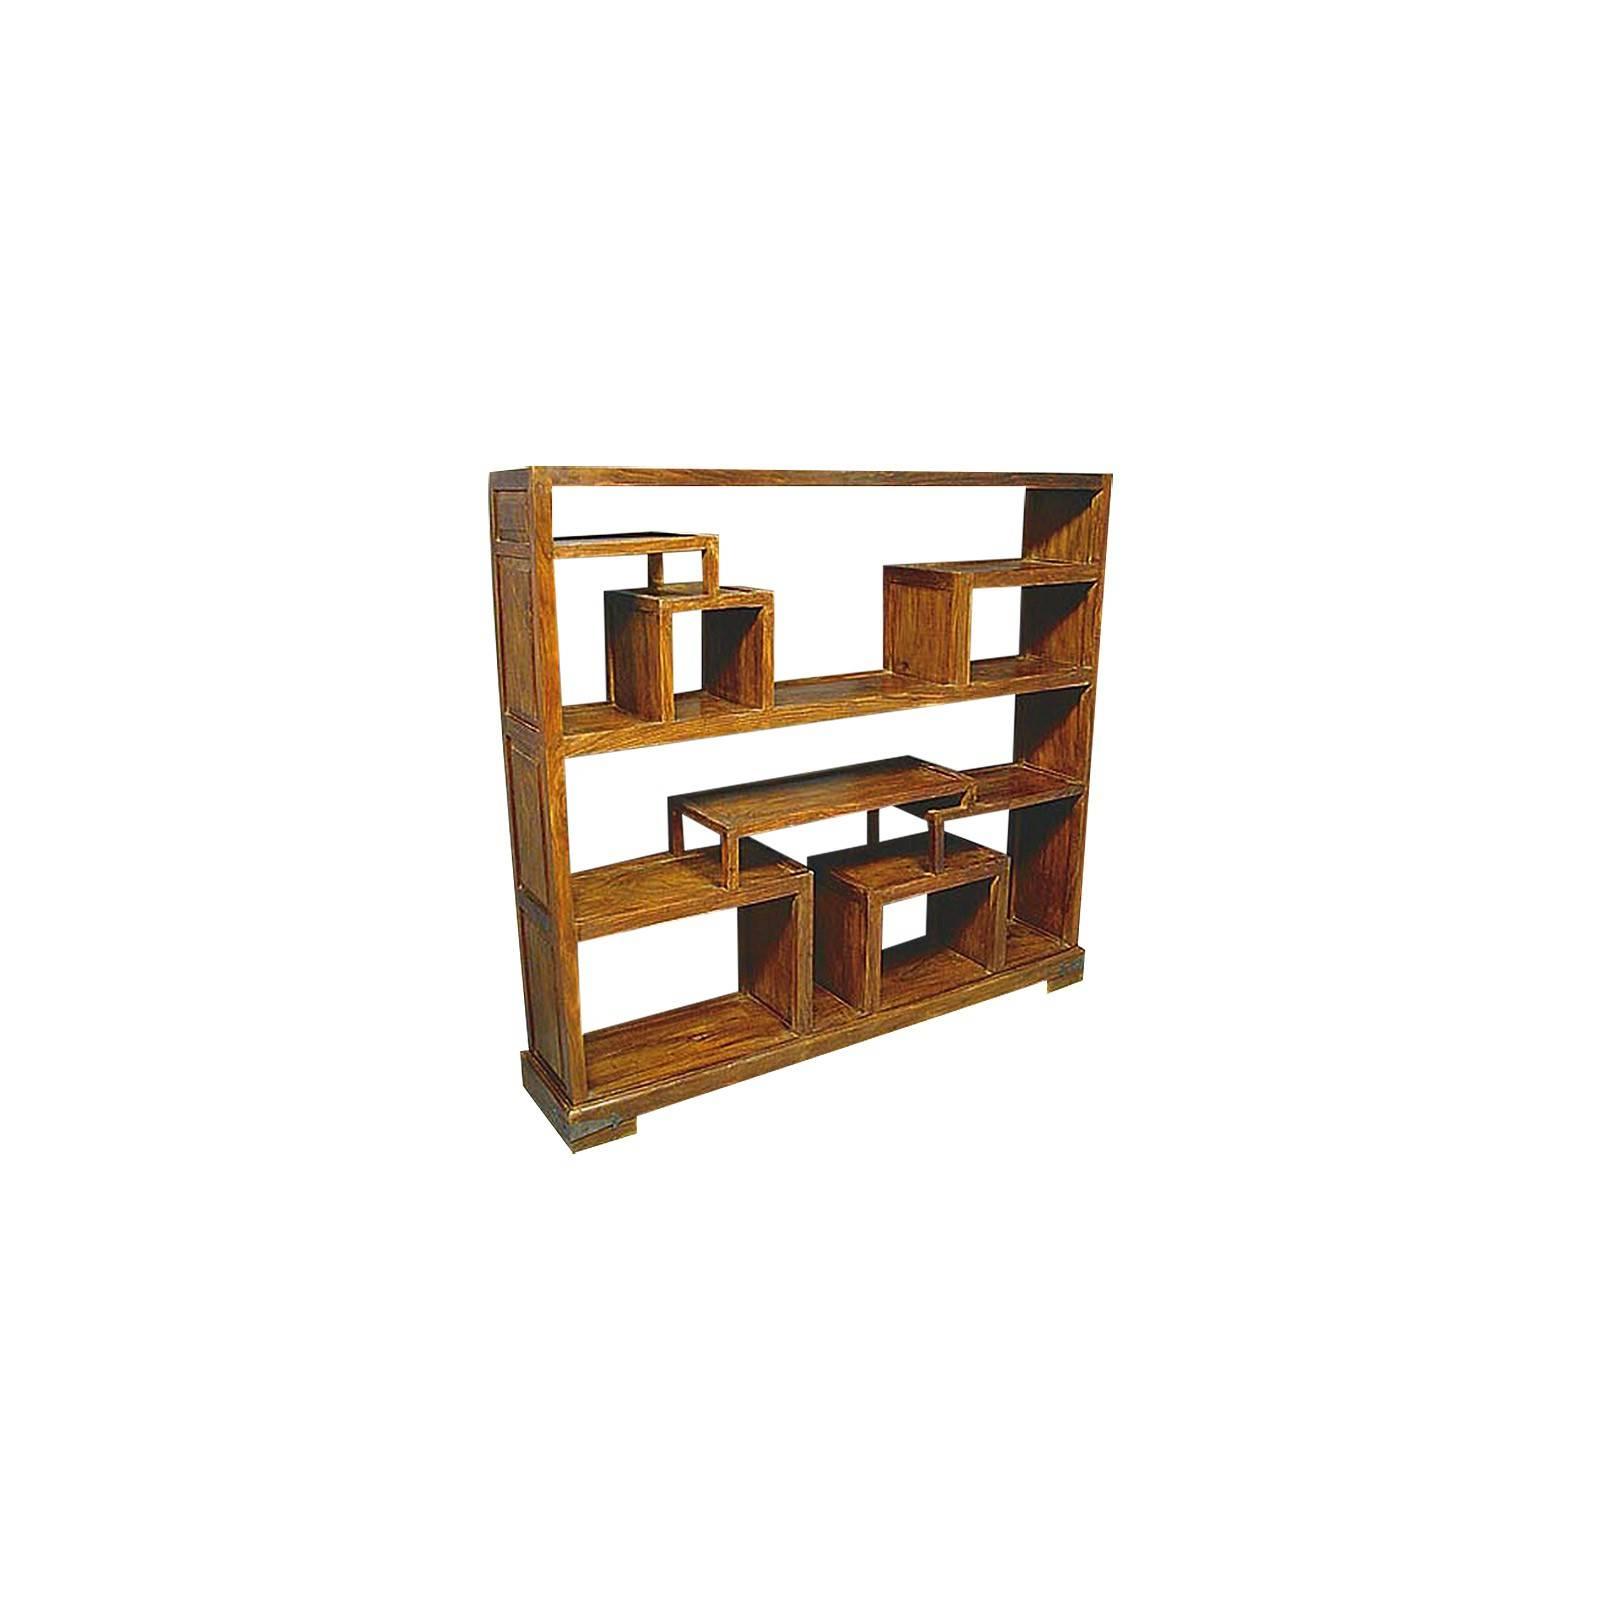 tag re en bois exotique d coration indienne lhassa. Black Bedroom Furniture Sets. Home Design Ideas